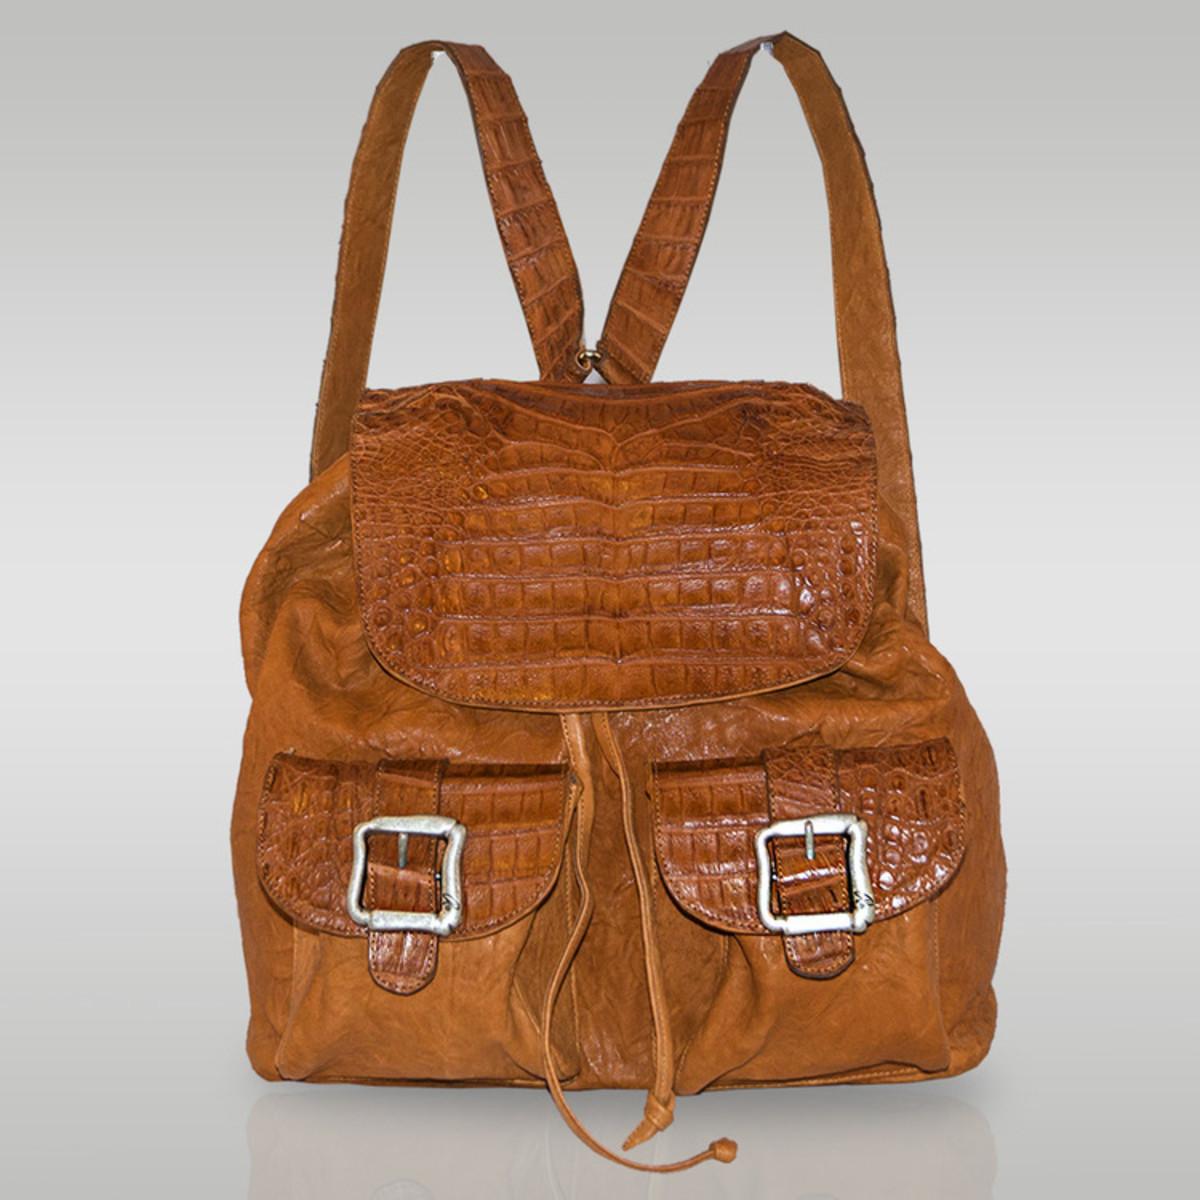 0000591_caserta-caiman-backpack-in-cognac